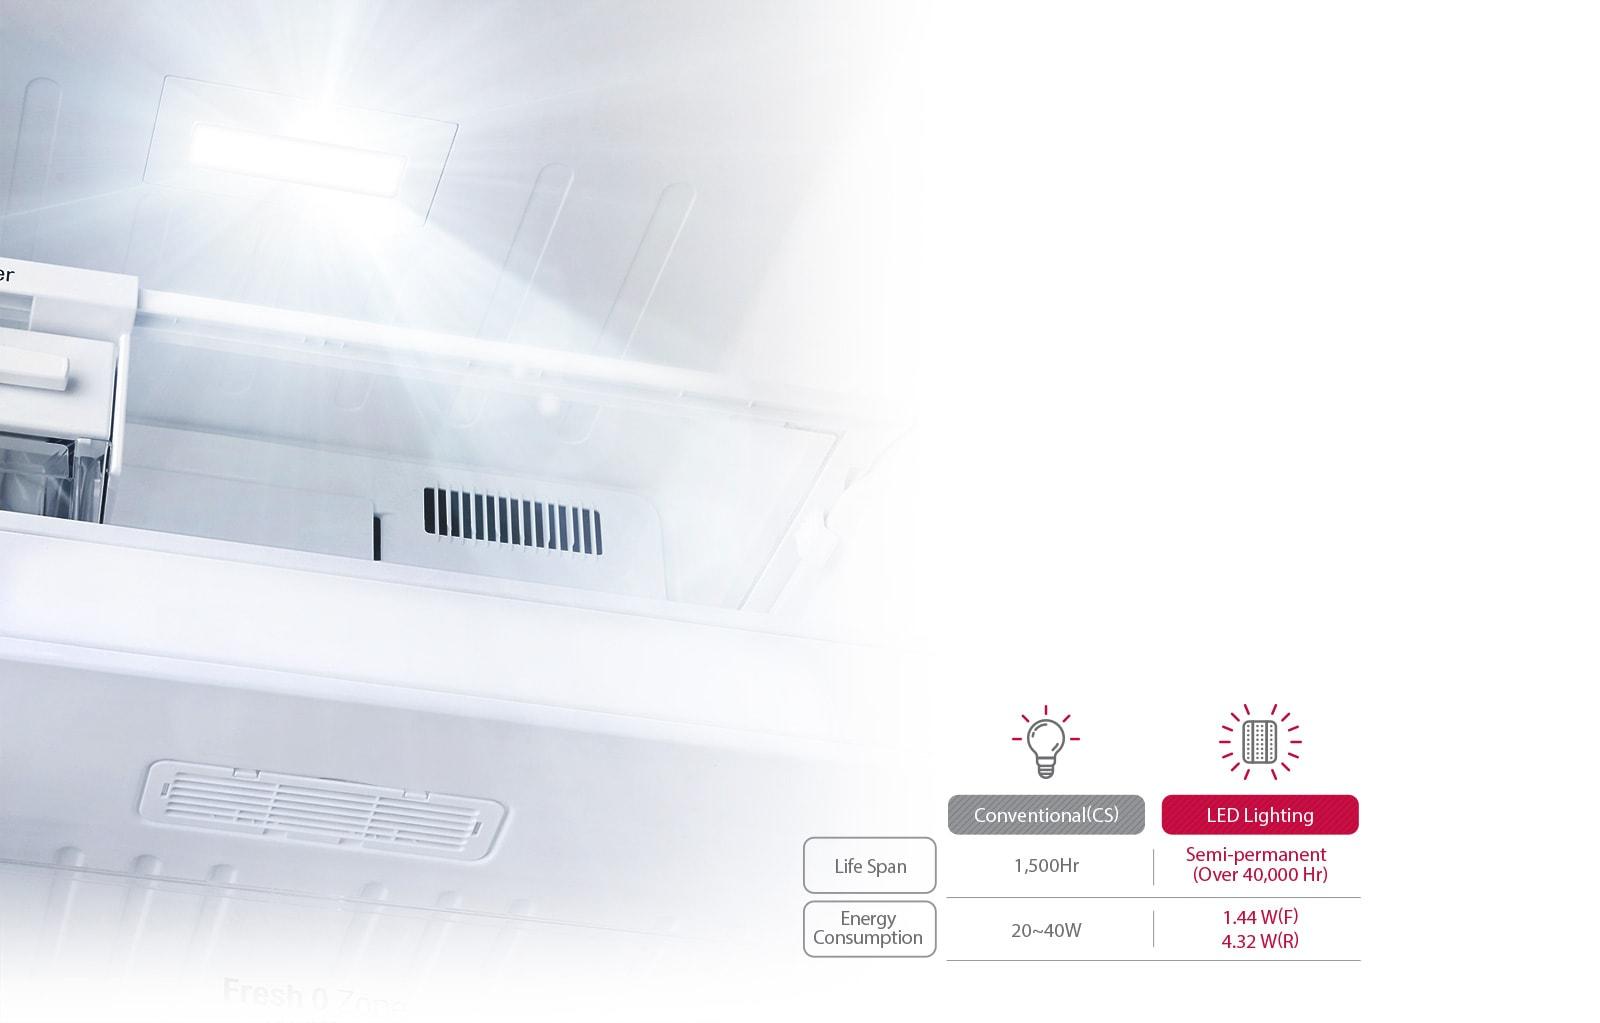 LG GL-N292BDSY 260 Ltr LED Lighting